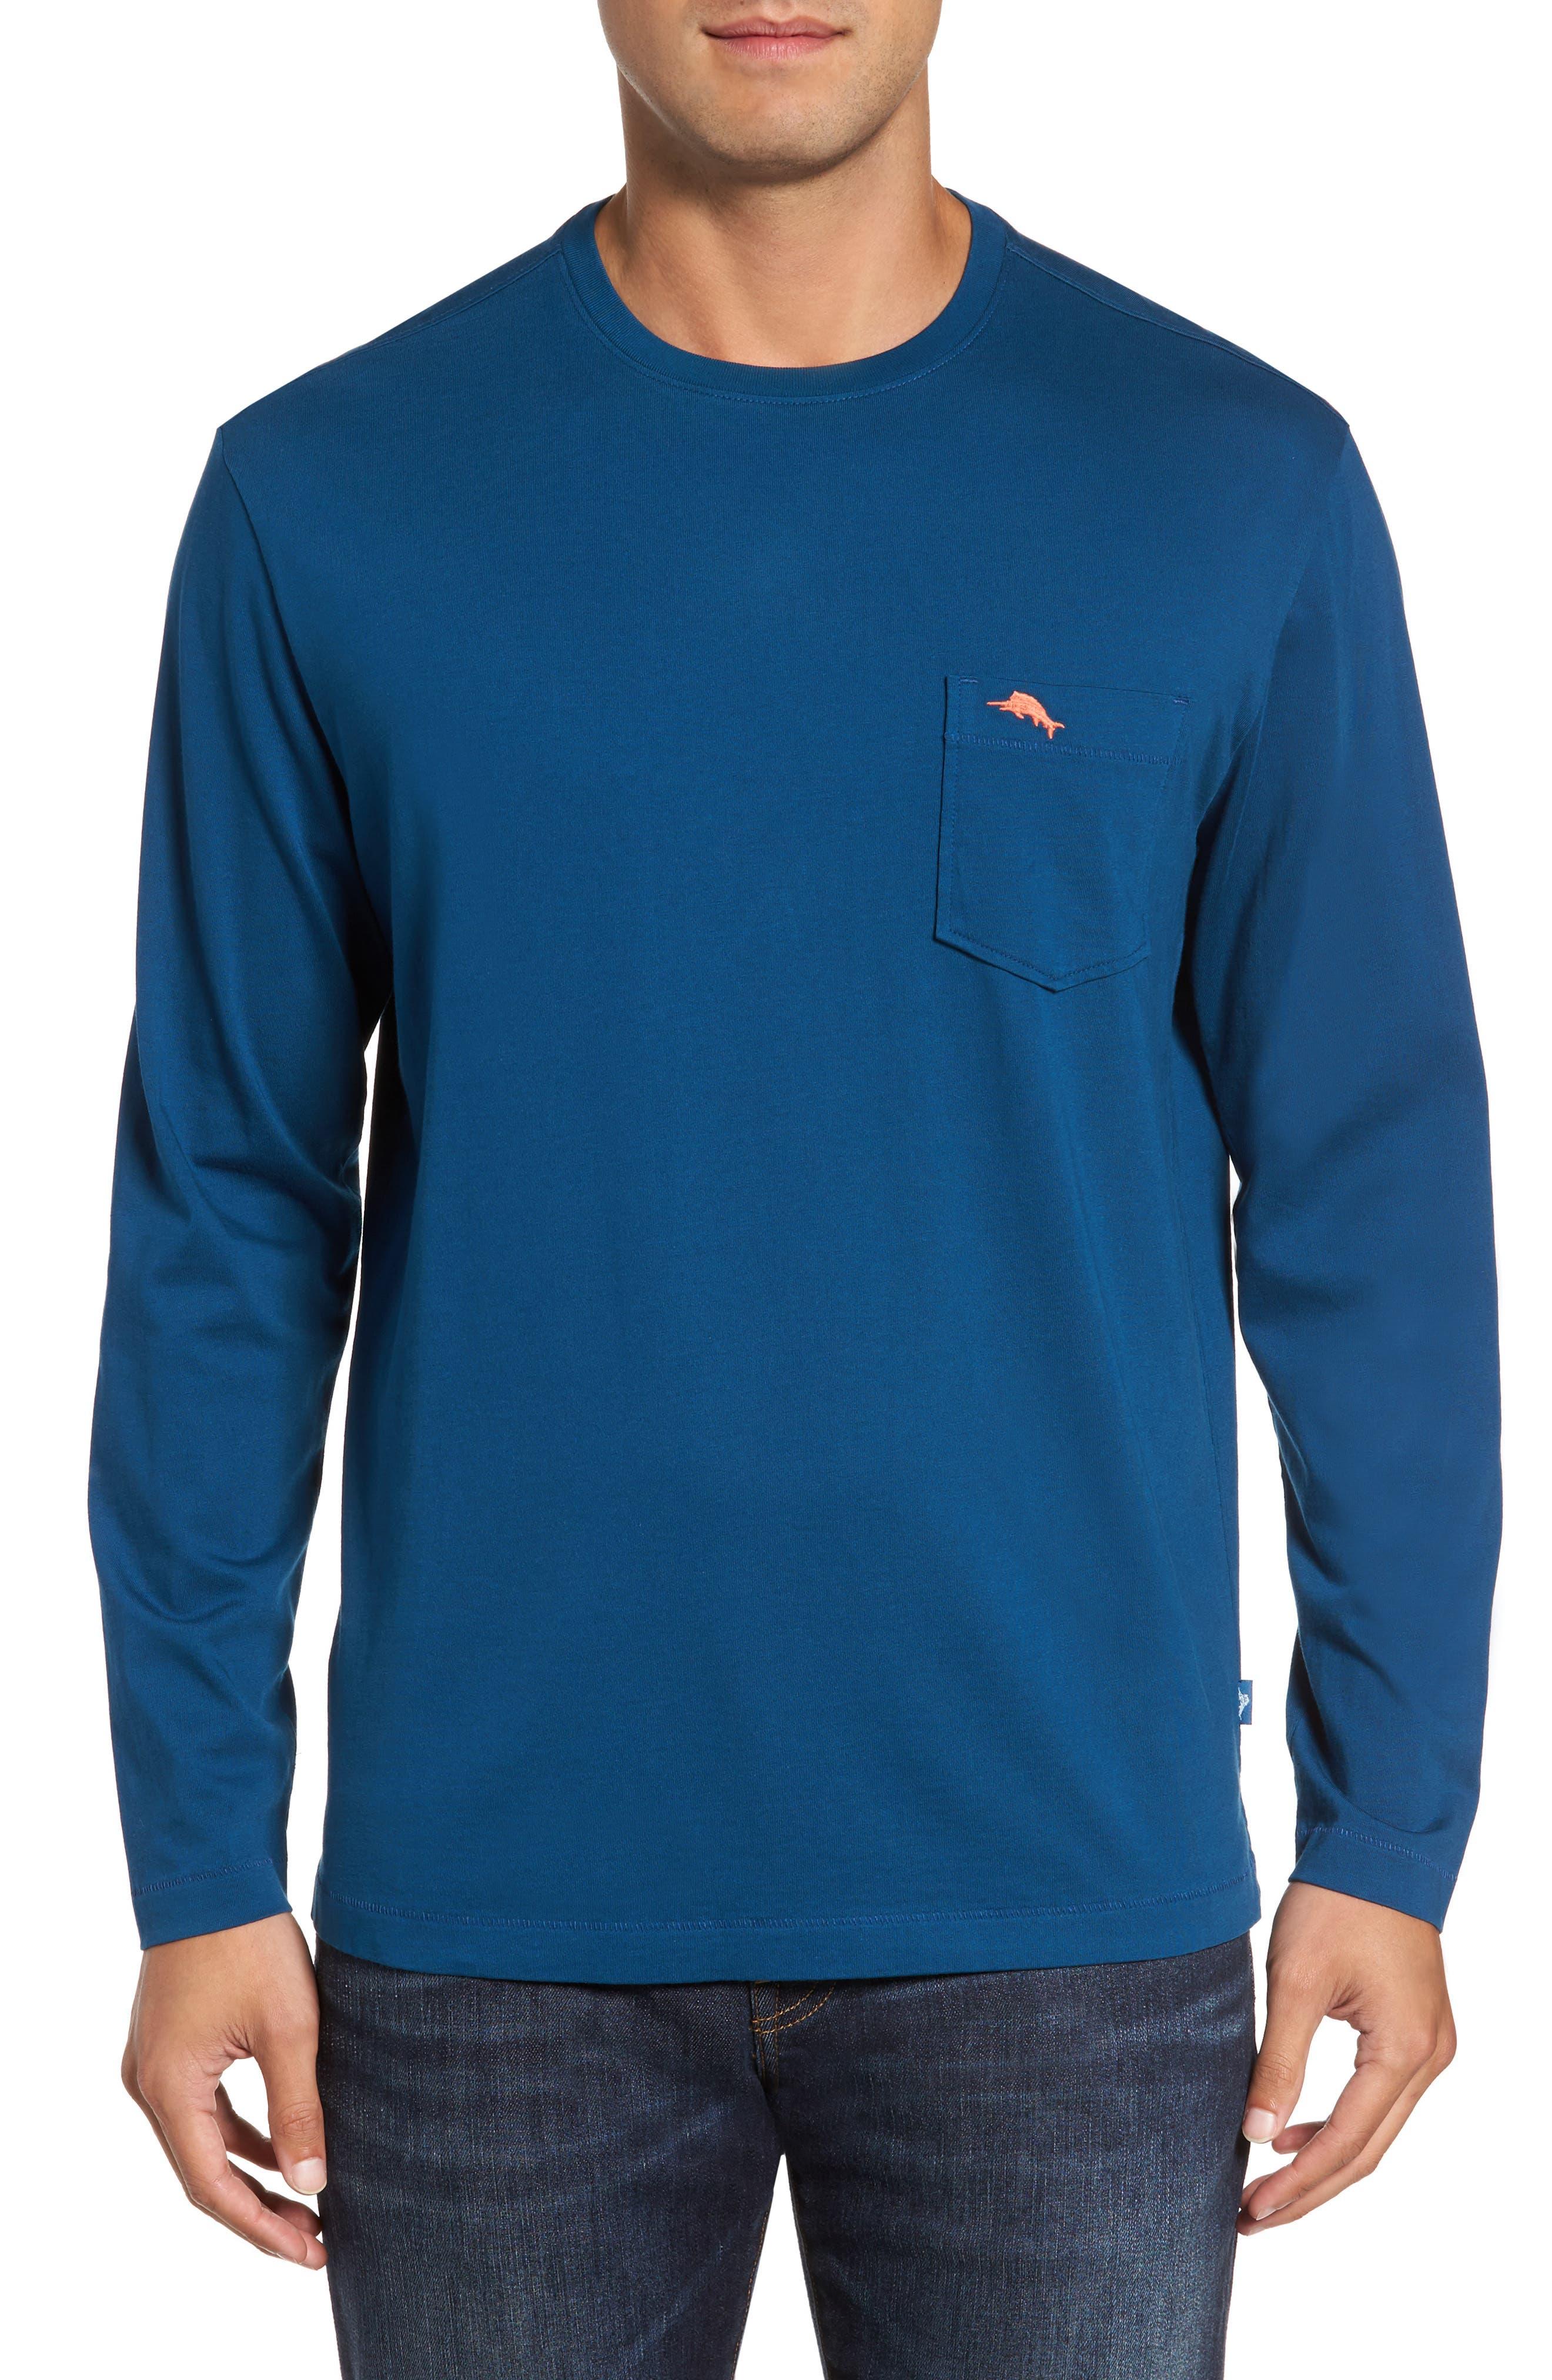 Alternate Image 1 Selected - Tommy Bahama New Bali Skyline T-Shirt